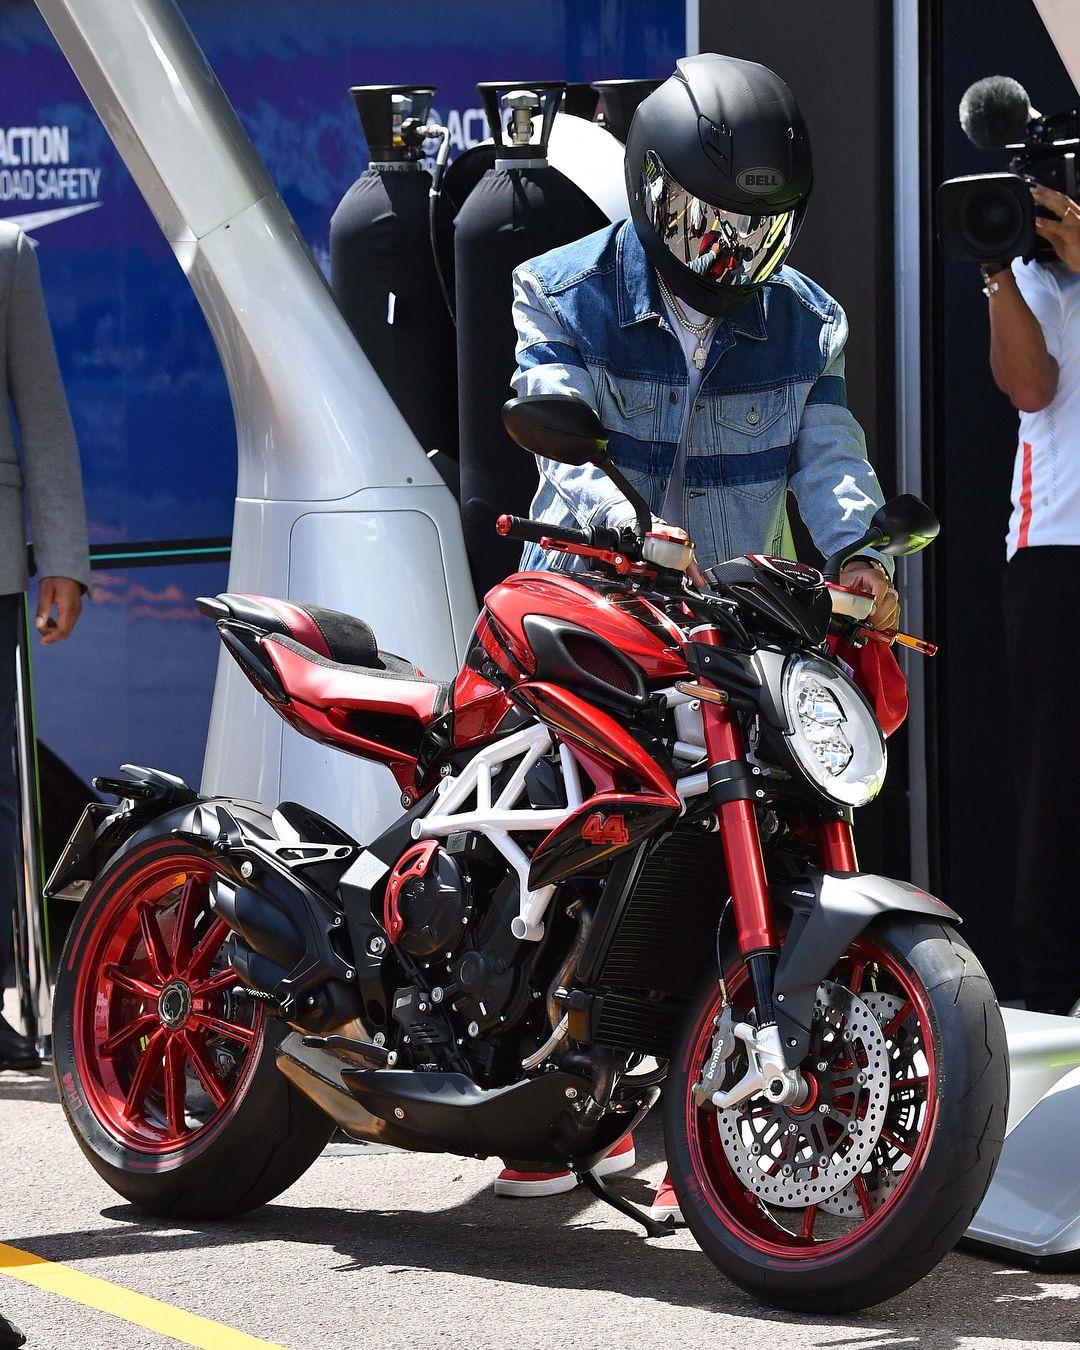 Lewis Hamilton Arrives On His Mv Agusta Motorbike In Monaco F1